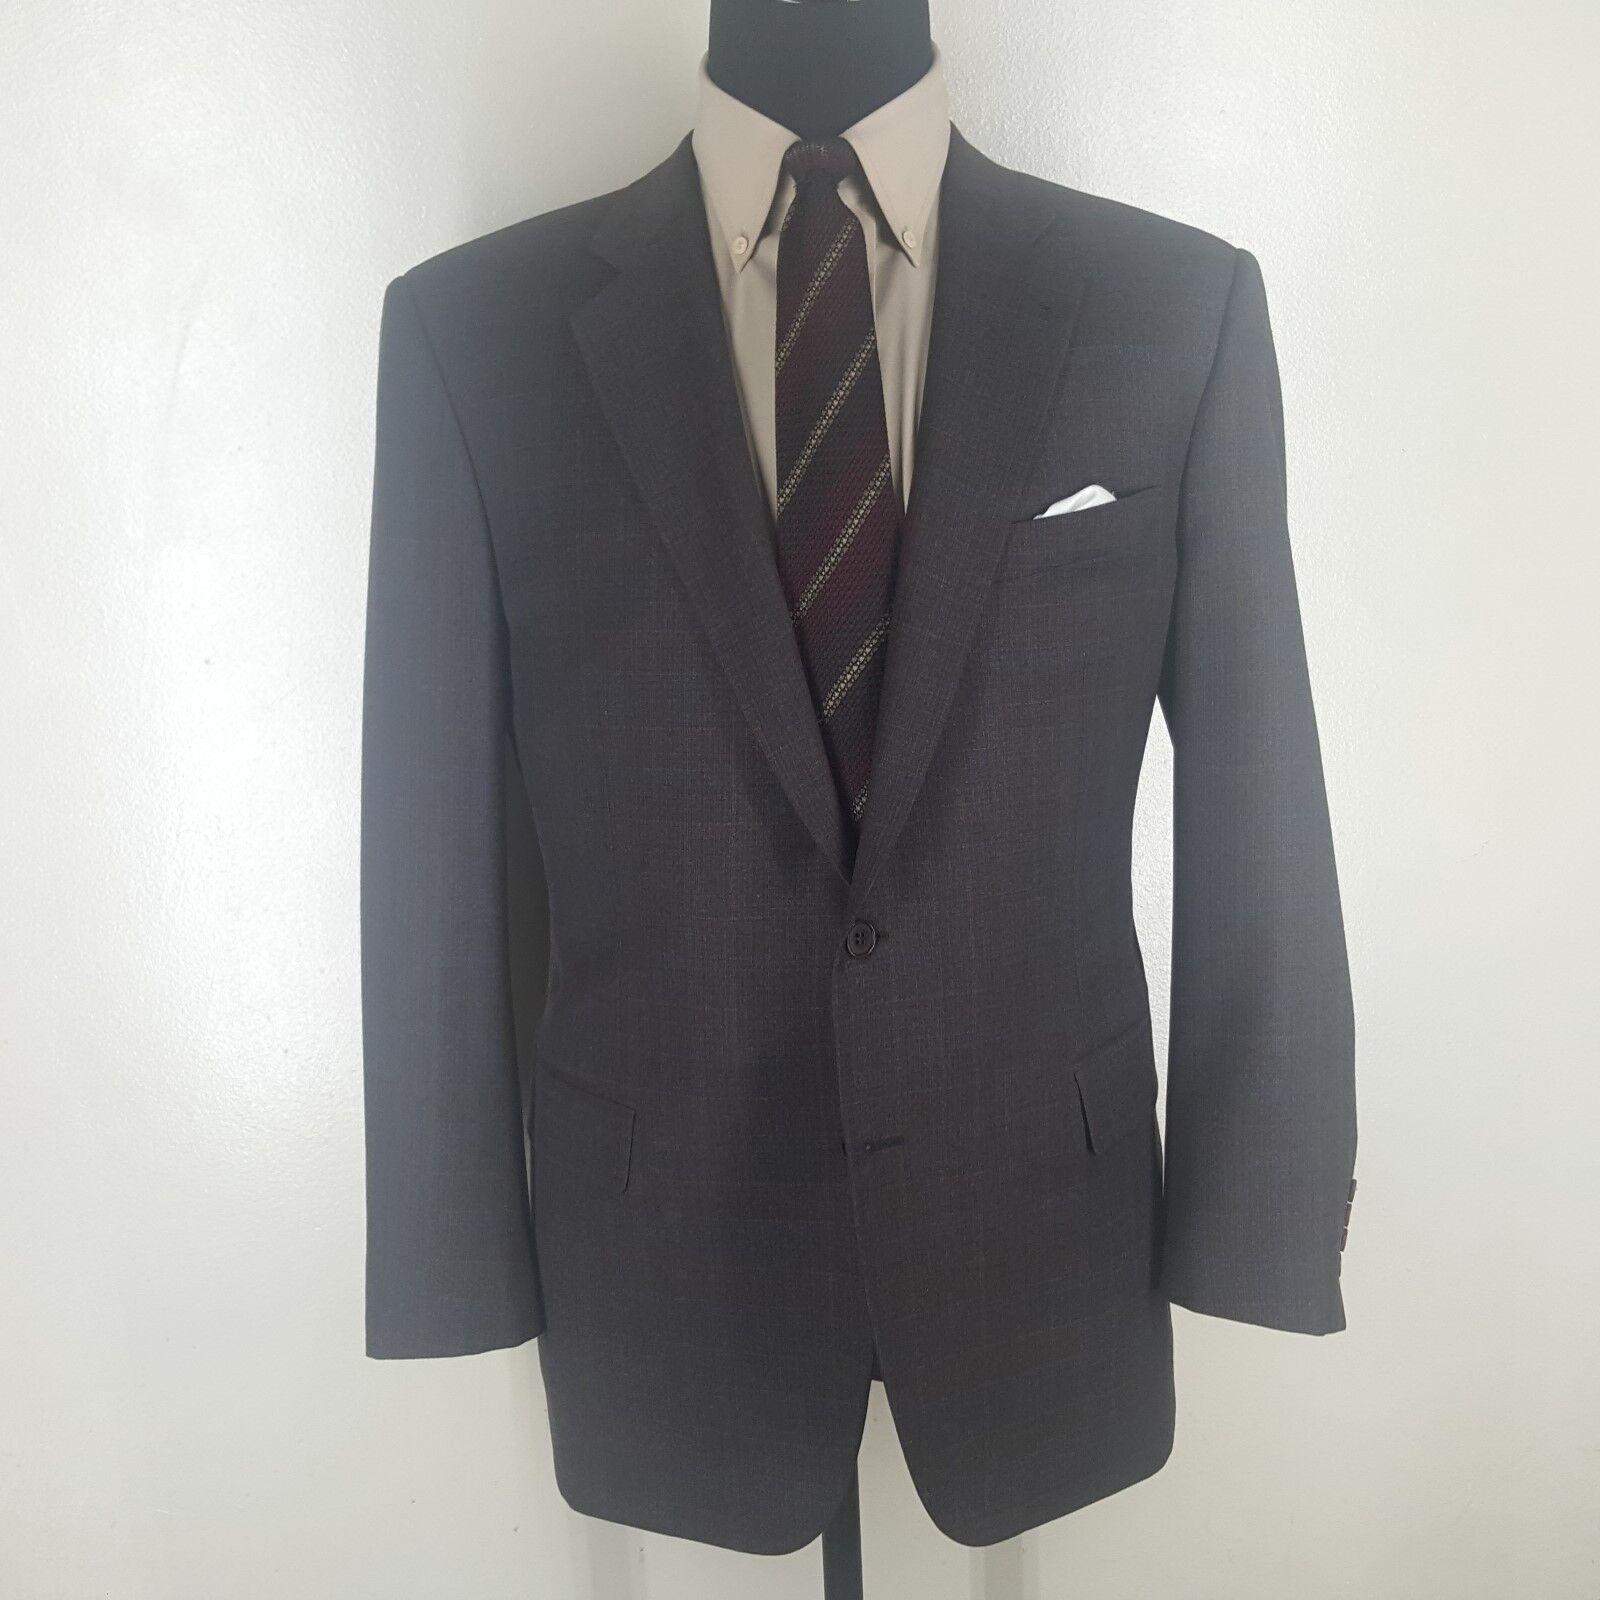 ZANELLA Made In  Sport Coat 2 Btn No Vents Wool & Cashmere  Fit 42- 44 Reg